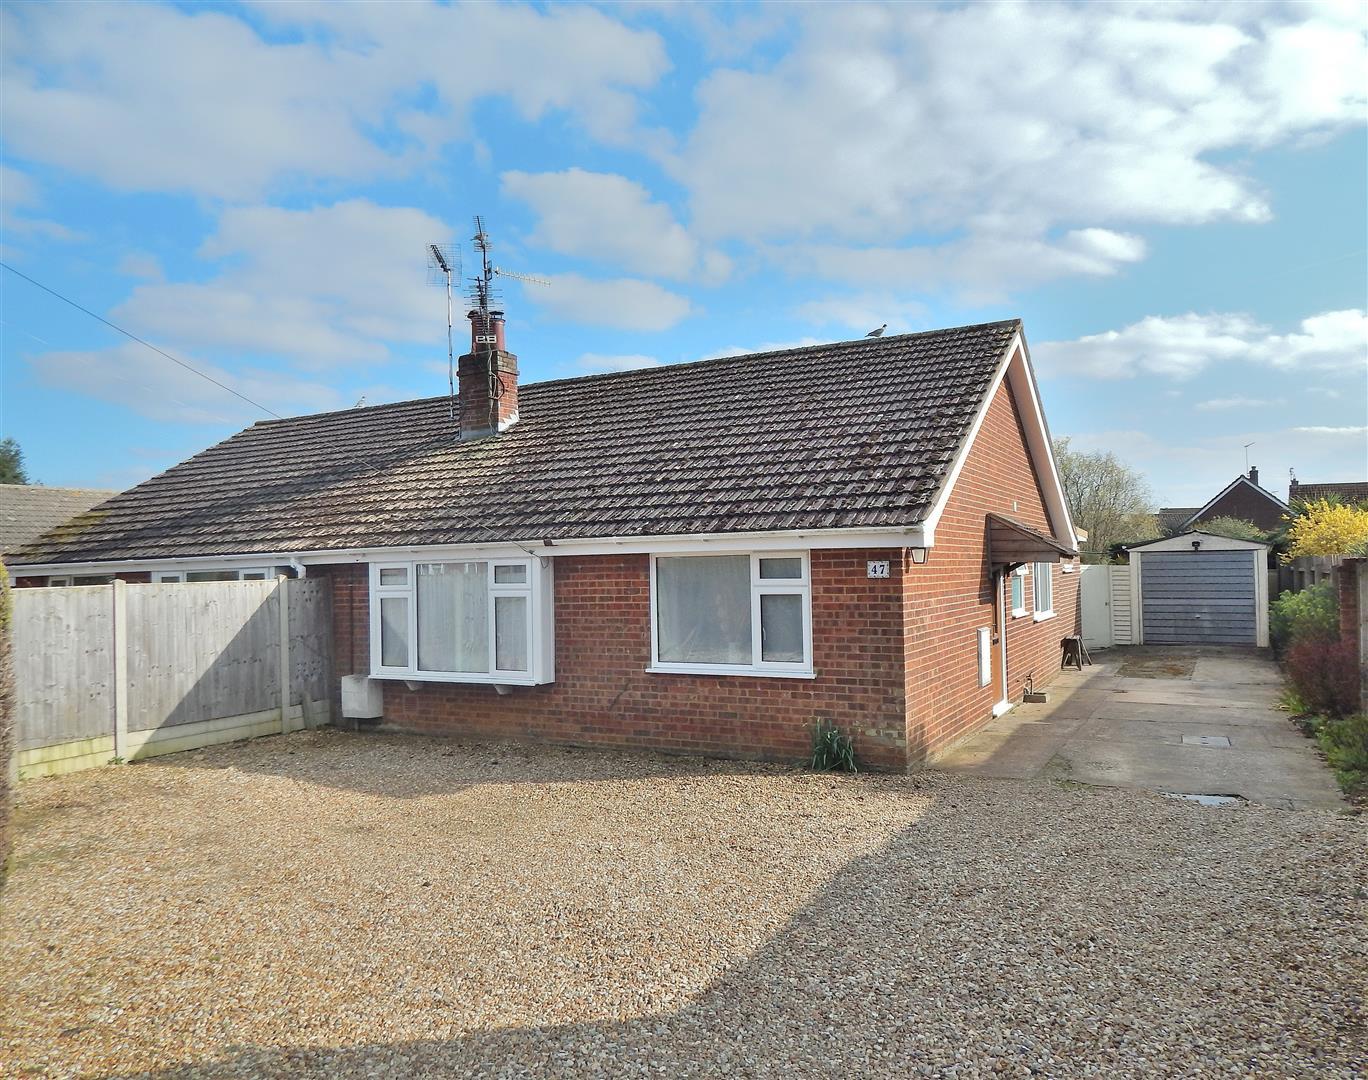 3 bed semi-detached bungalow for sale in King's Lynn, PE31 6PR, PE31